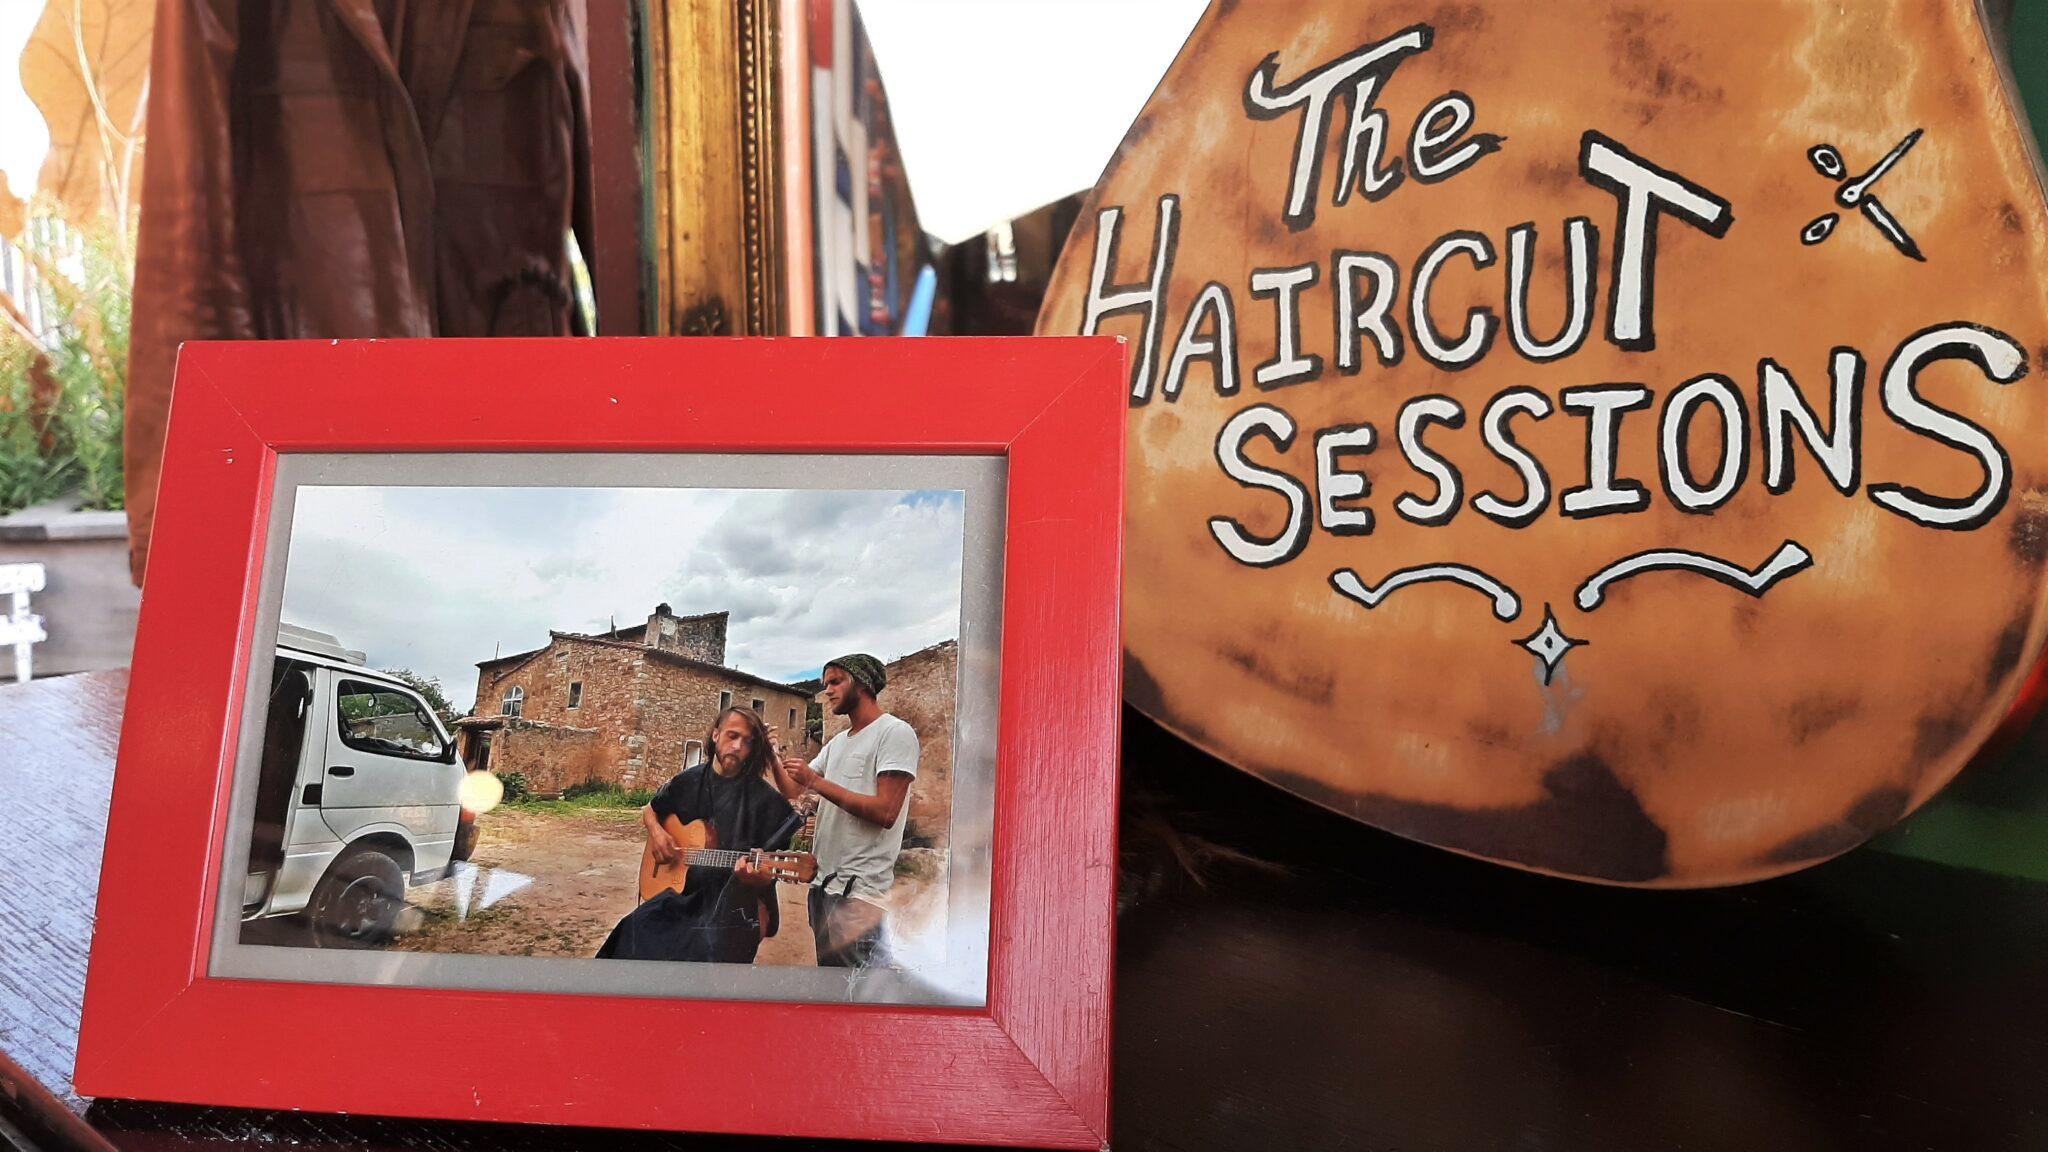 The Haircutsessions gitaar